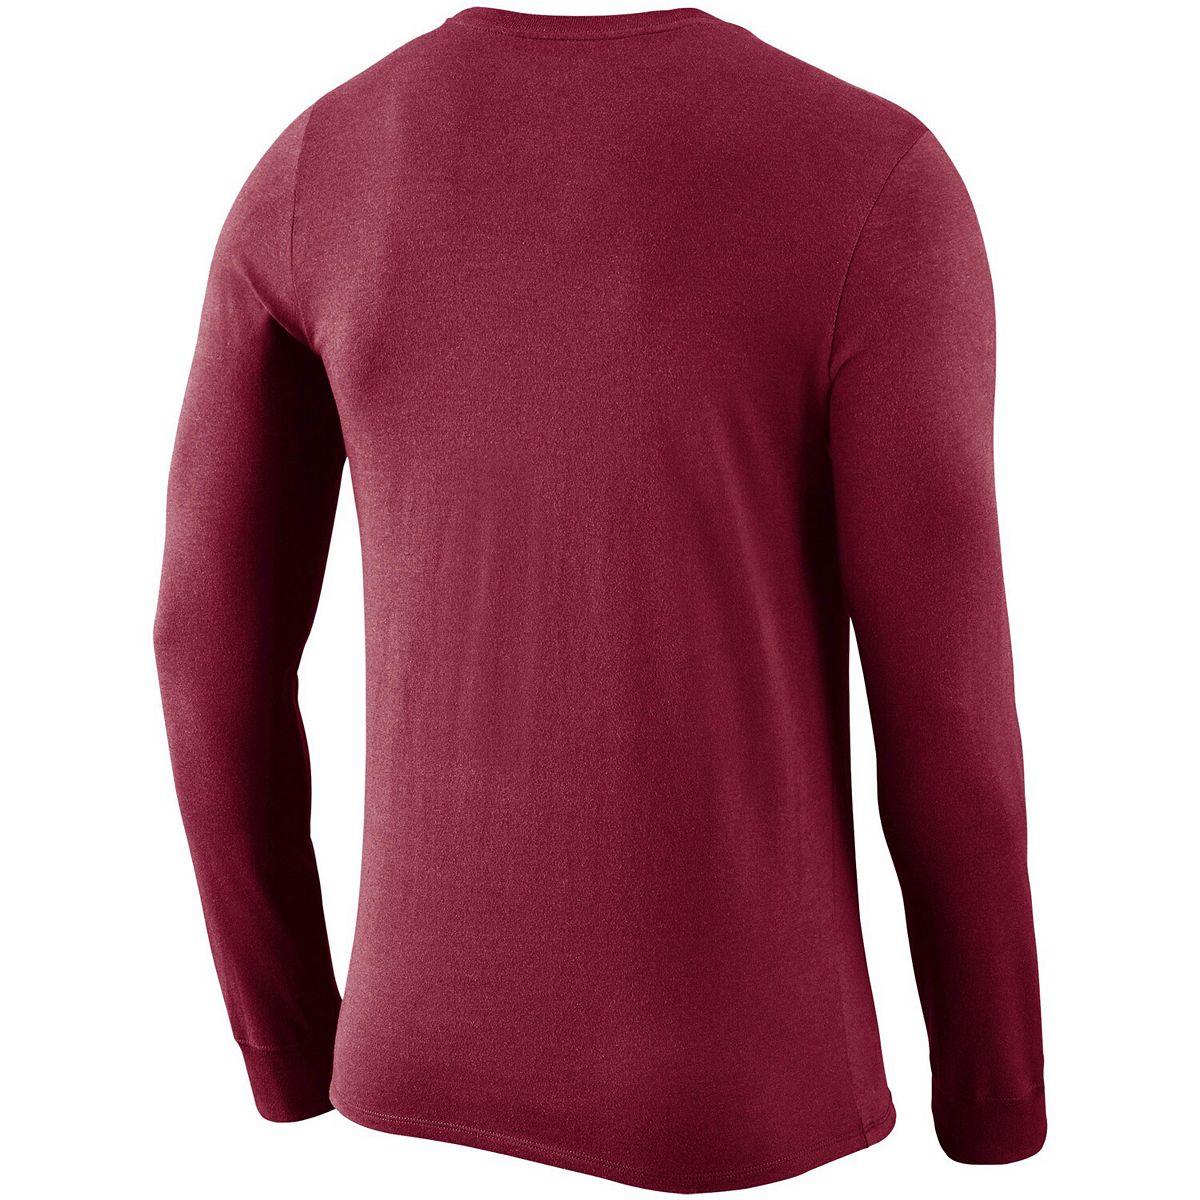 Men's Nike Garnet Florida State Seminoles 2018 Facility Dri-FIT Cotton Long Sleeve T-Shirt 7fuXV